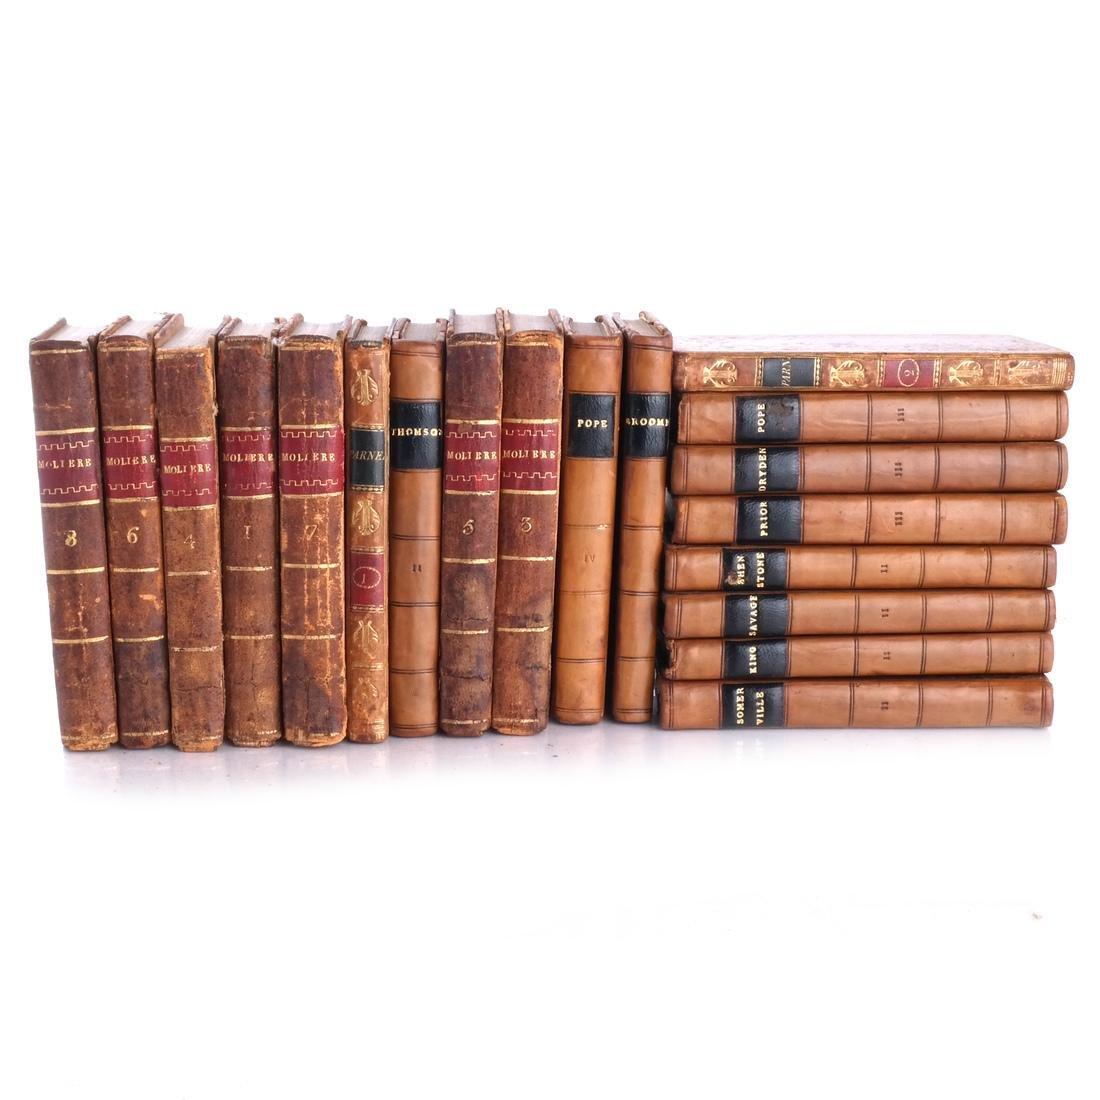 Books: 50+ Volumes - 2